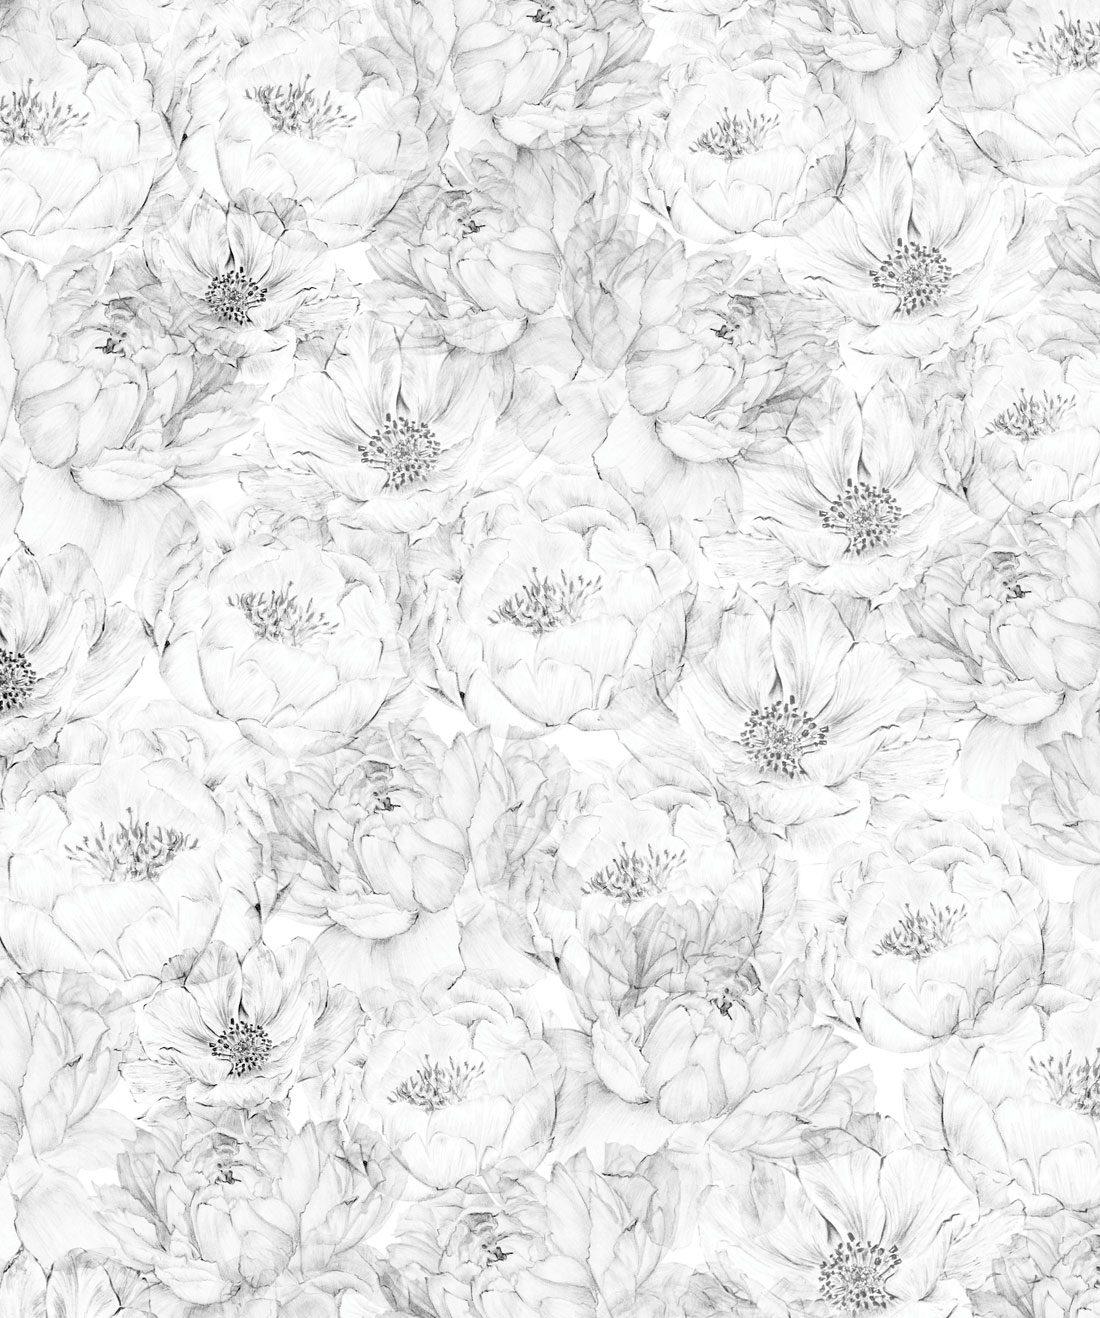 Peonies & Anemones (Large)